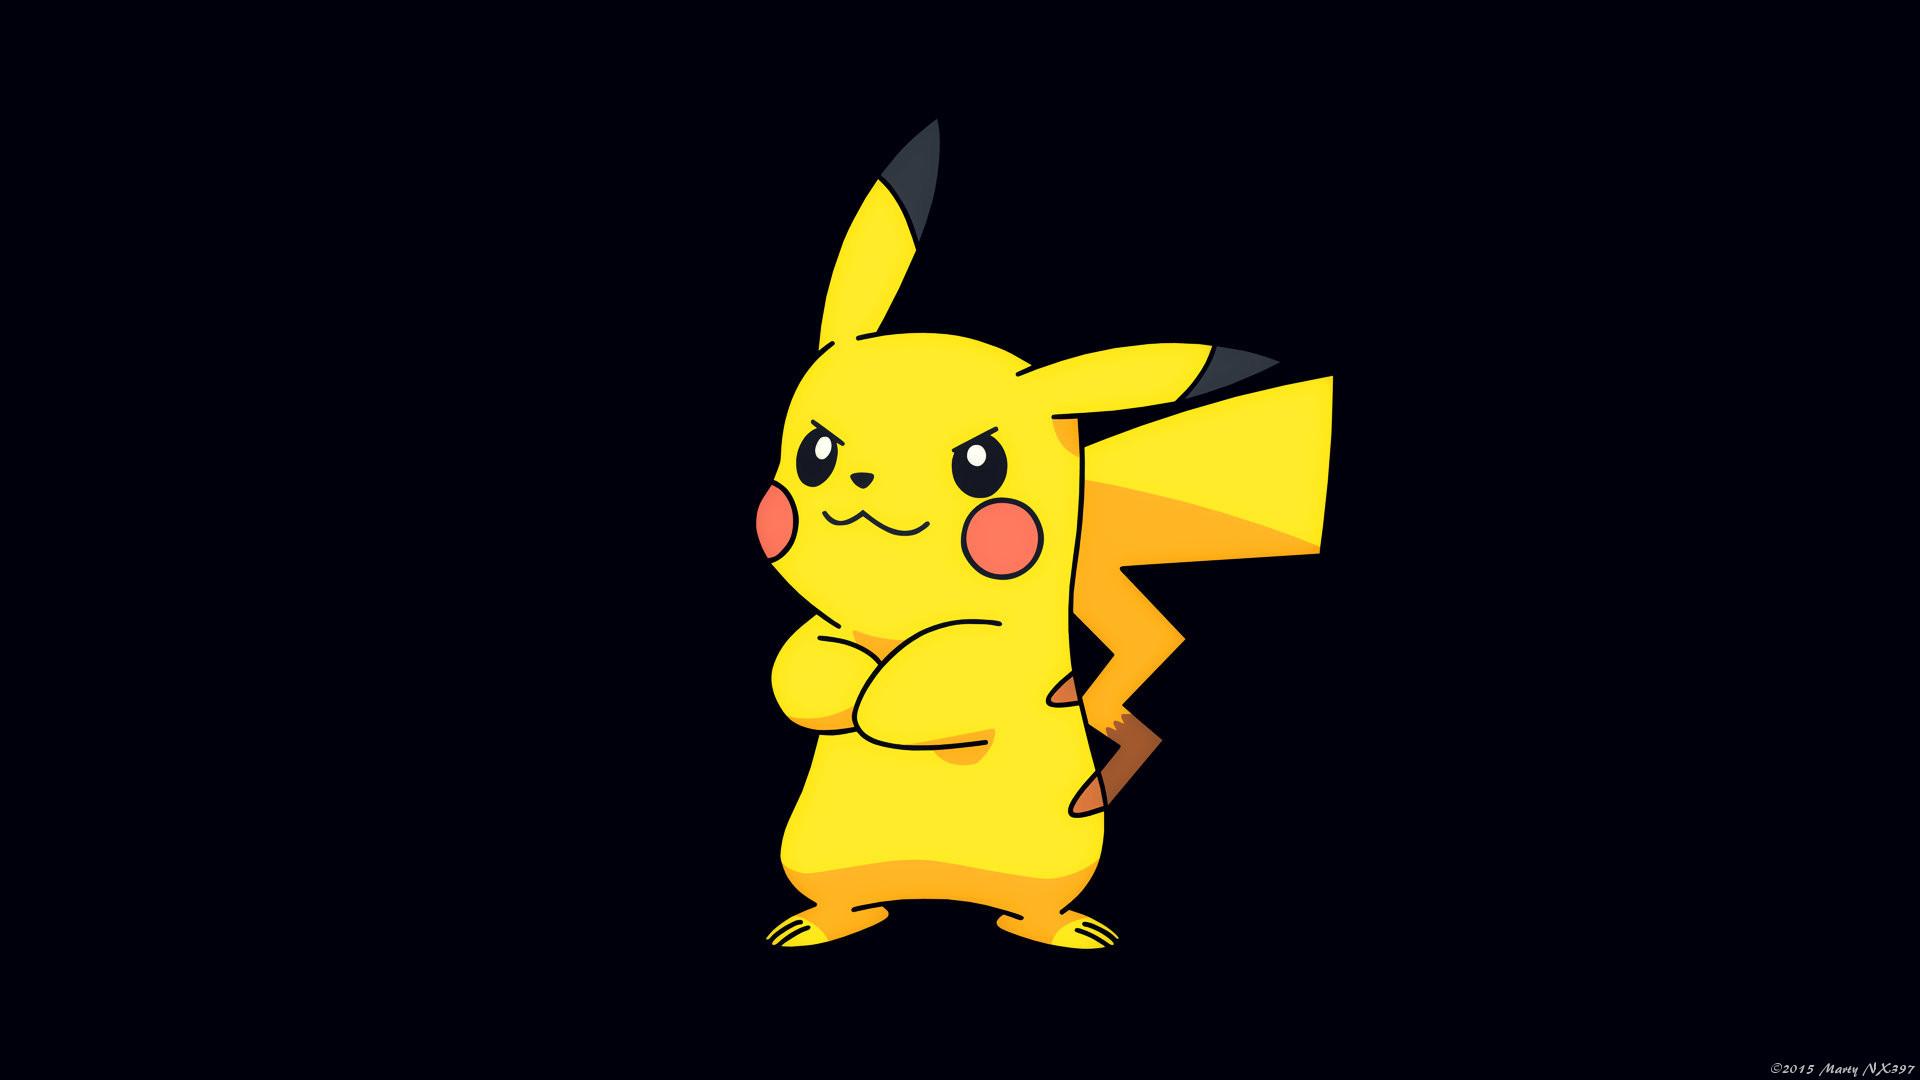 rate 0 tweet 1920x1080 games pokemon pikachu resolution 1920x1080 1920x1080